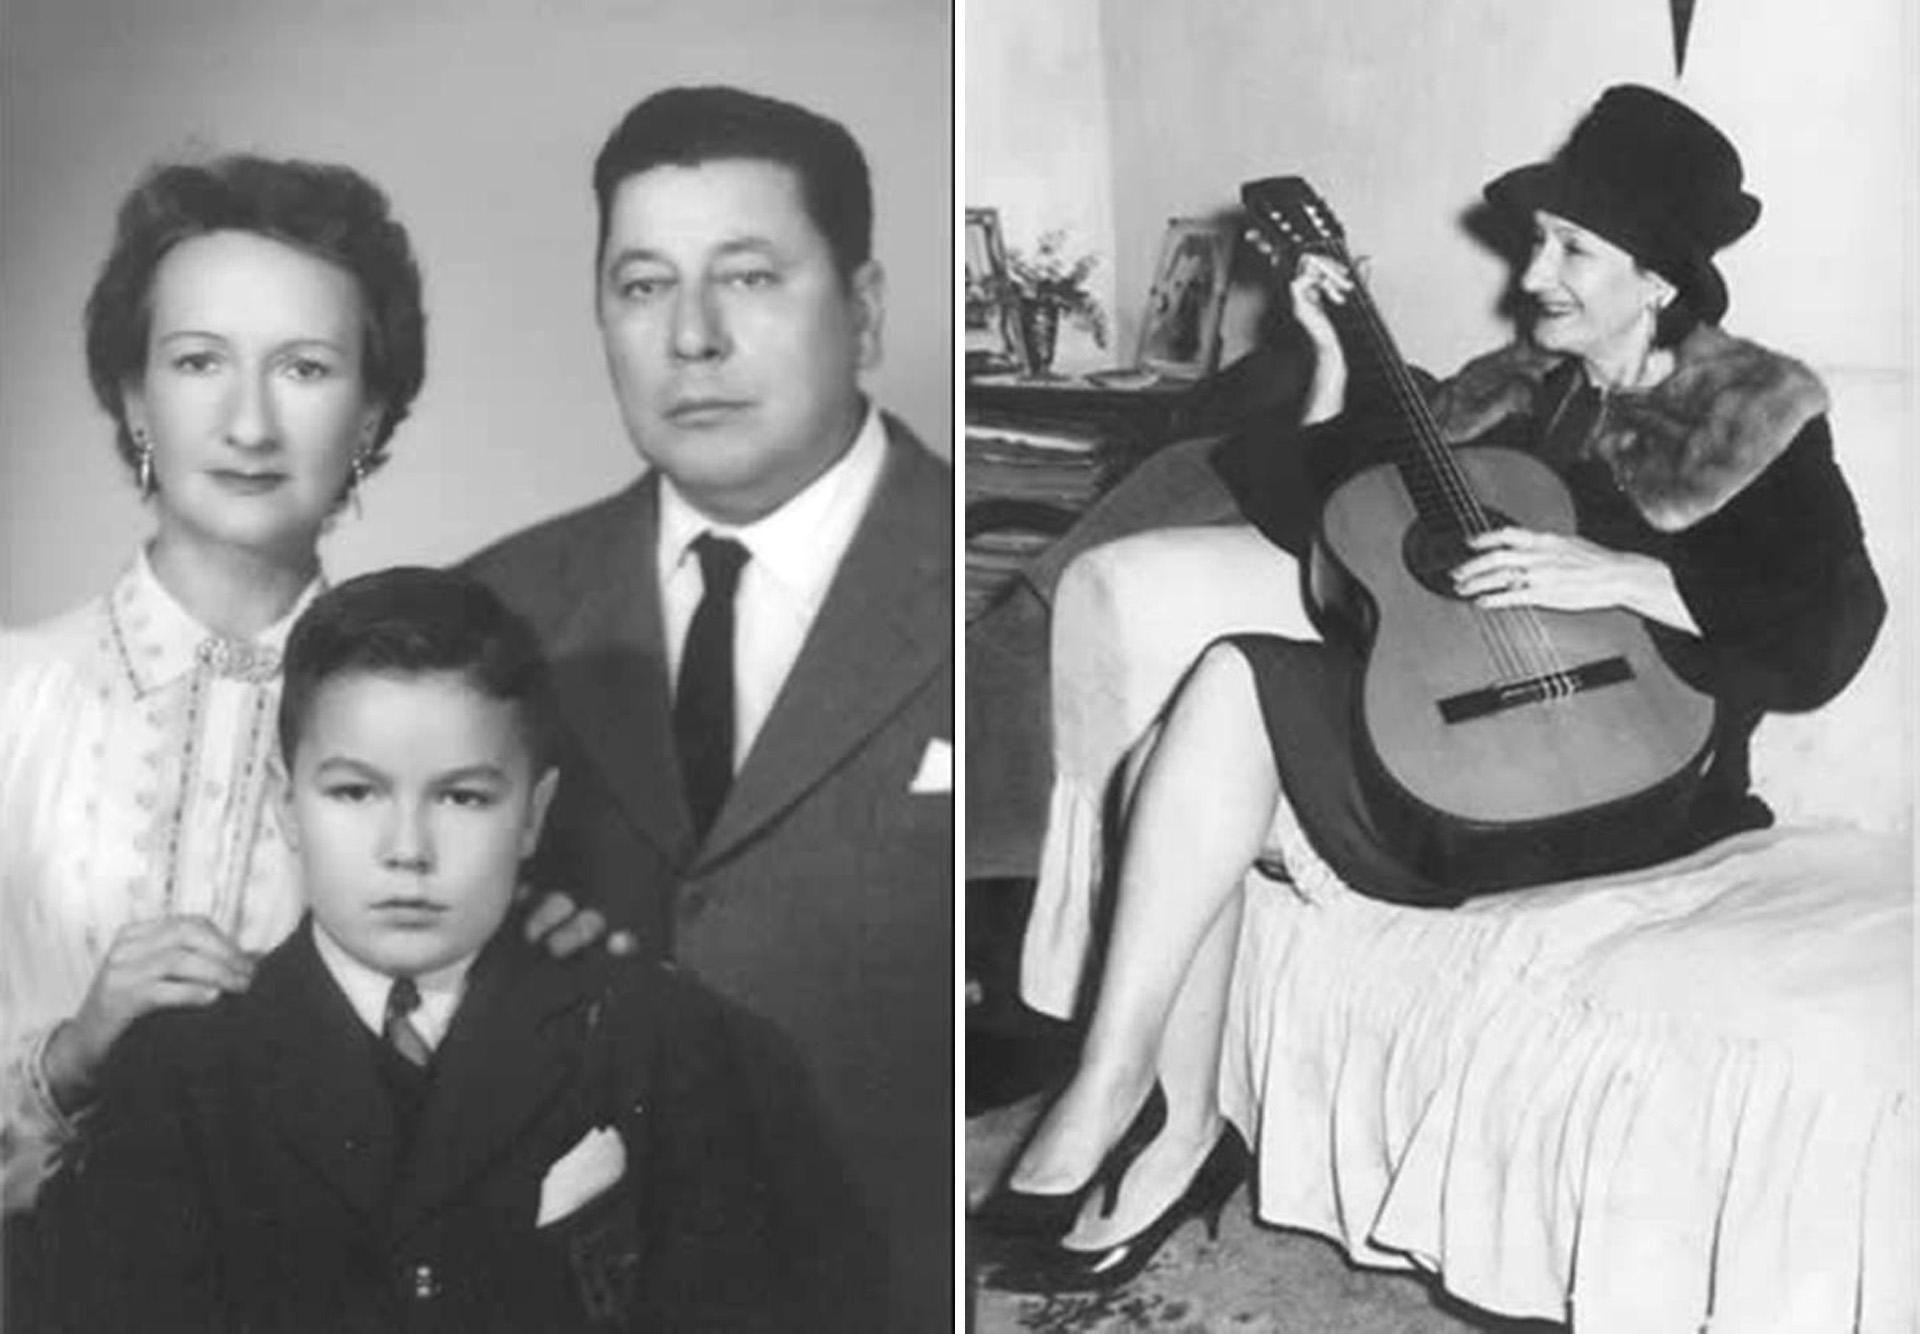 La familia (Nennete, Roberto y Atahualpa) / Nenette tocando la guitarra